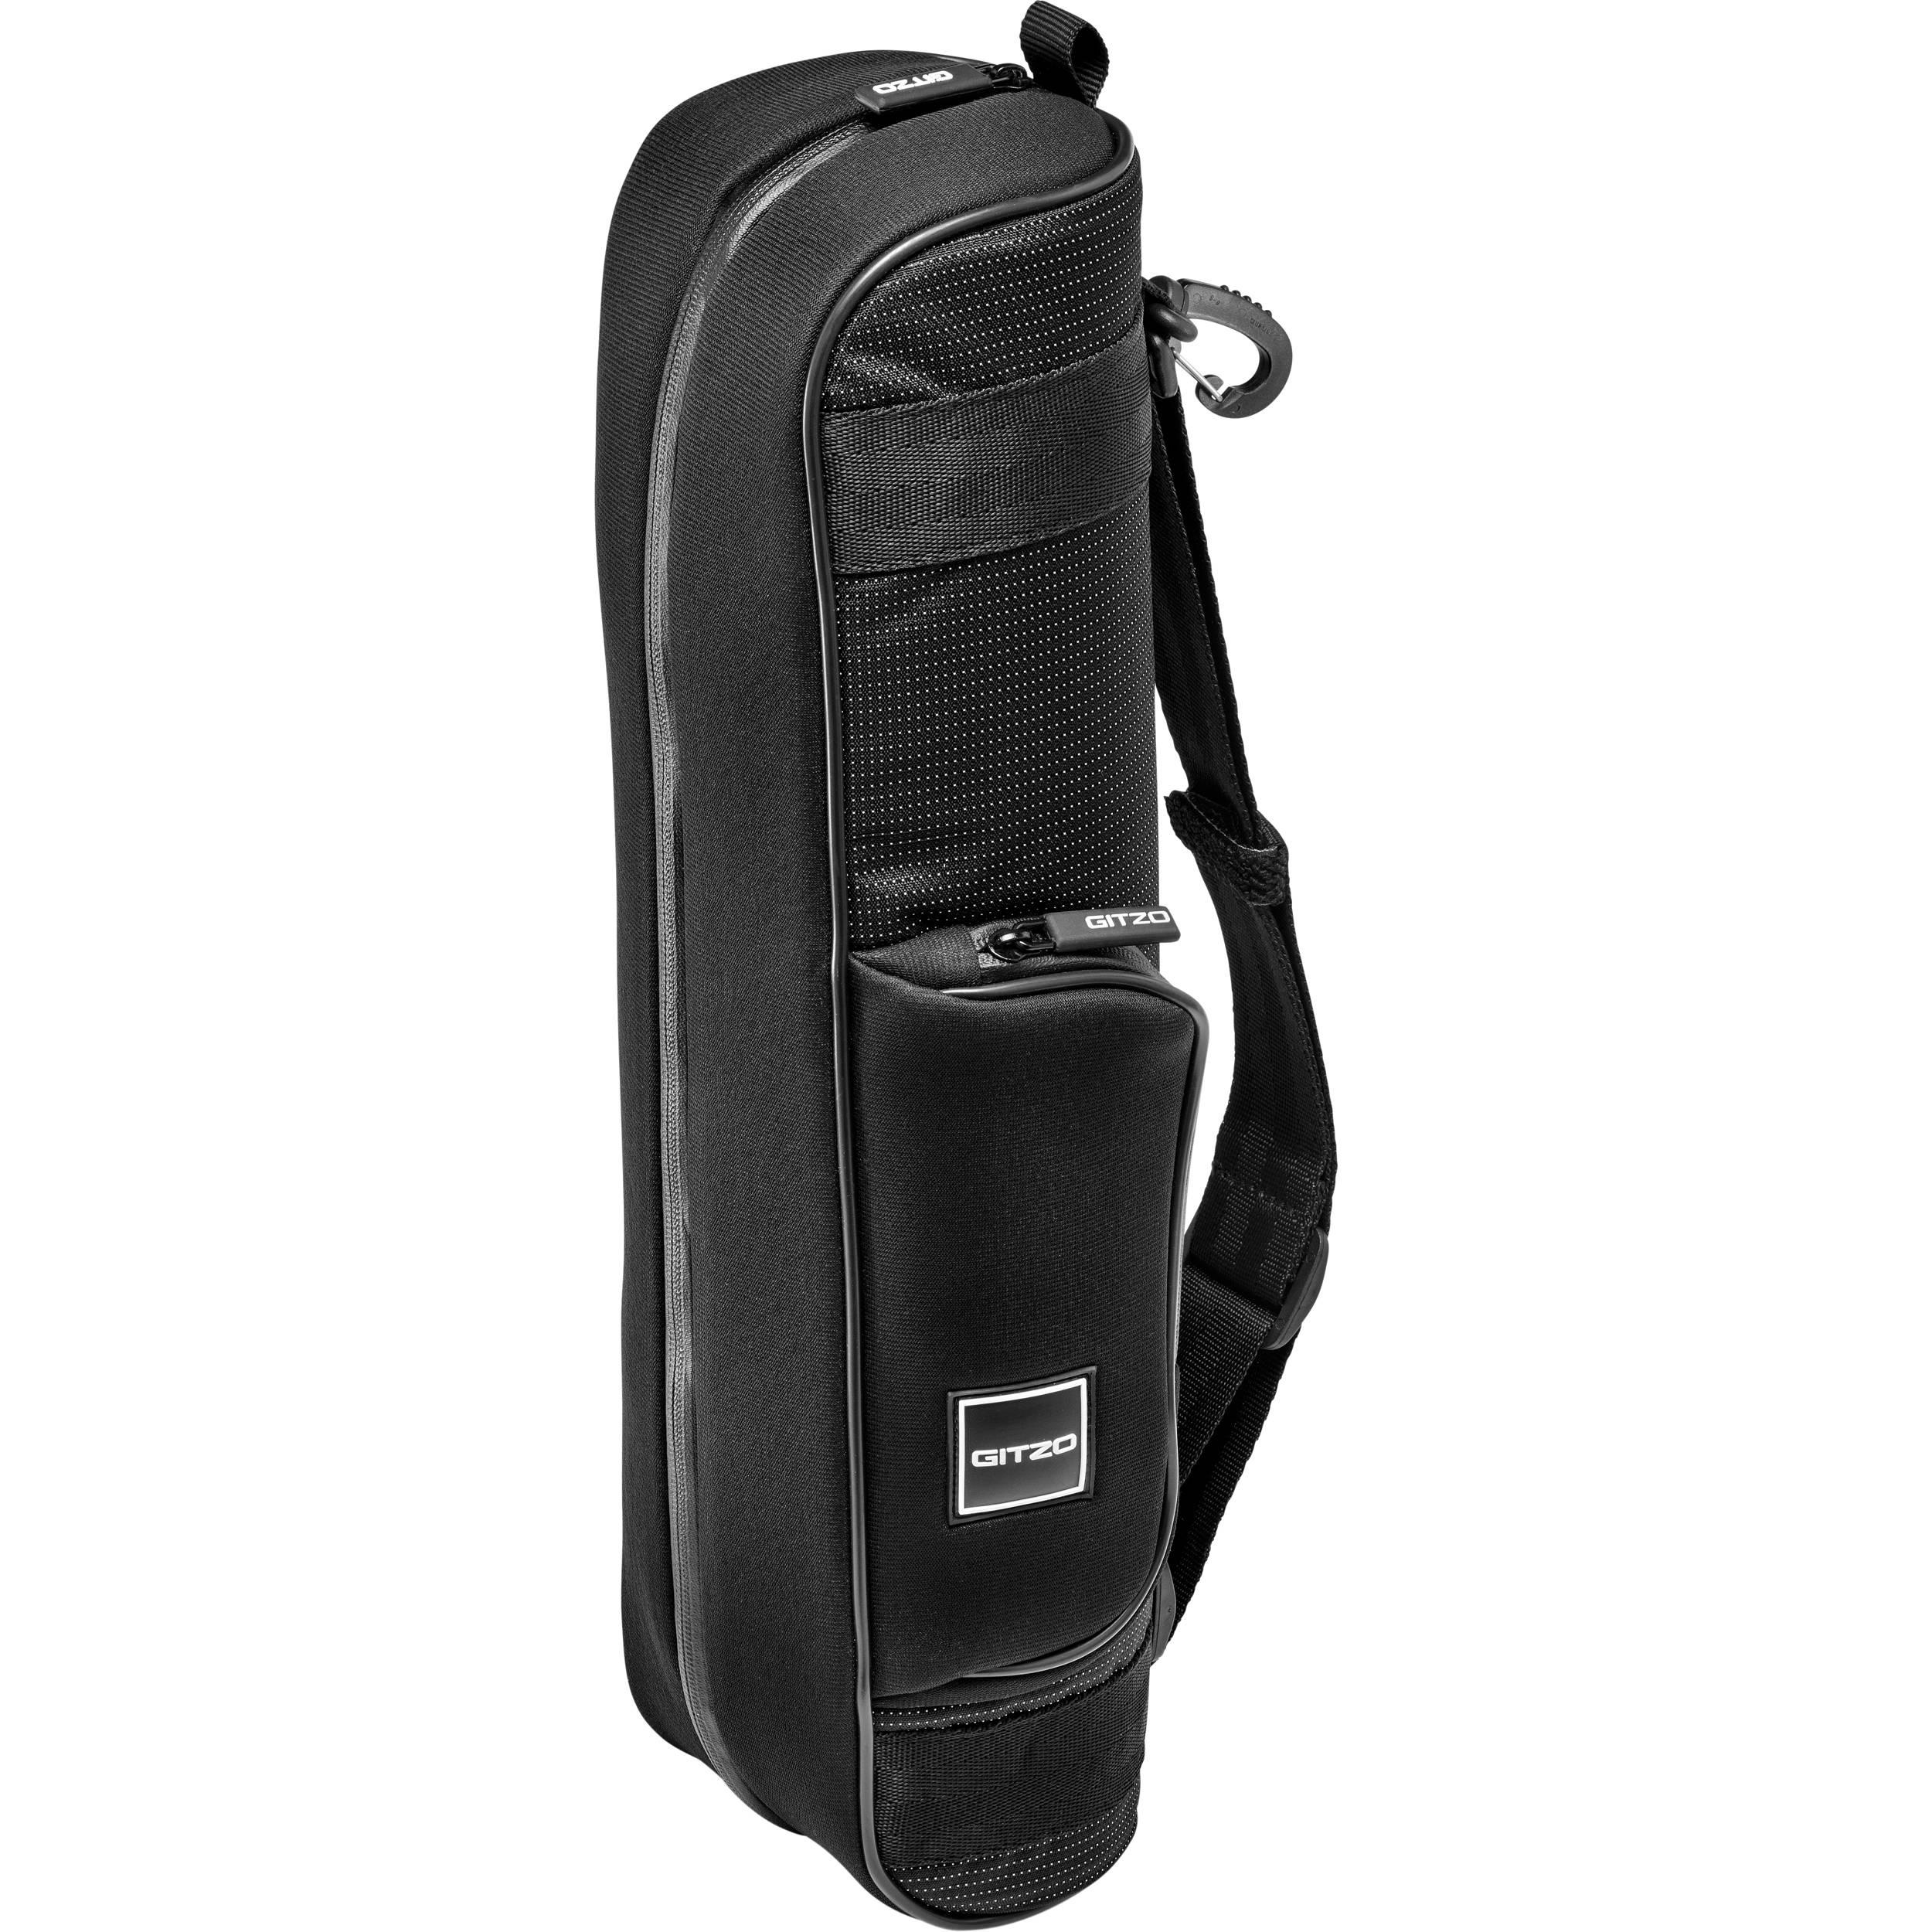 Gitzo GC2202T Padded Traveler Tripod Bag Series 2 GC2202T B&H